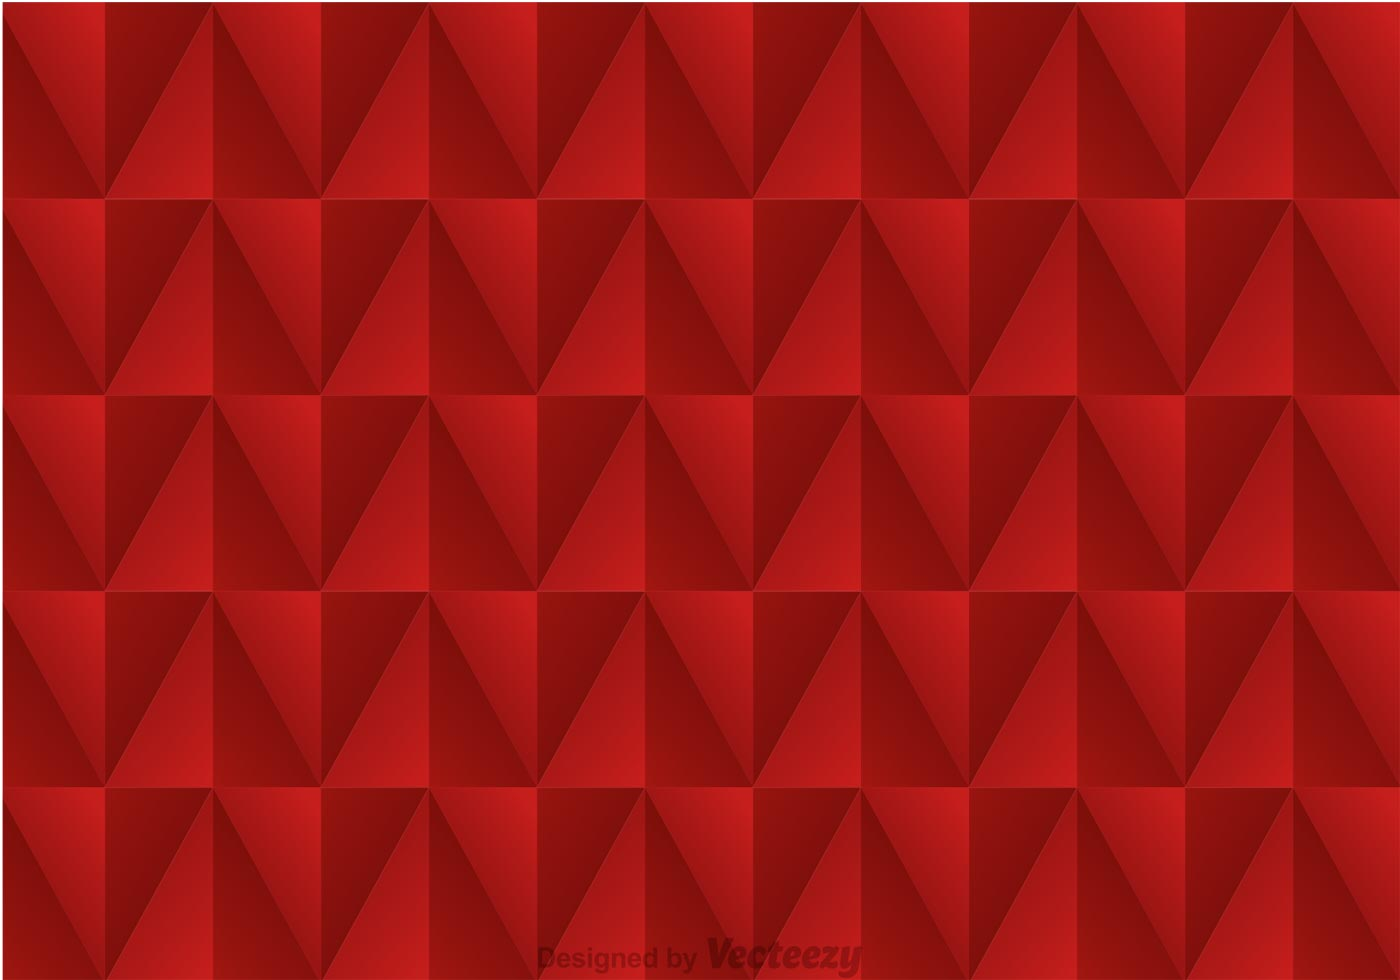 Maroon triangle background vector download free vector - Maroon wallpaper ...